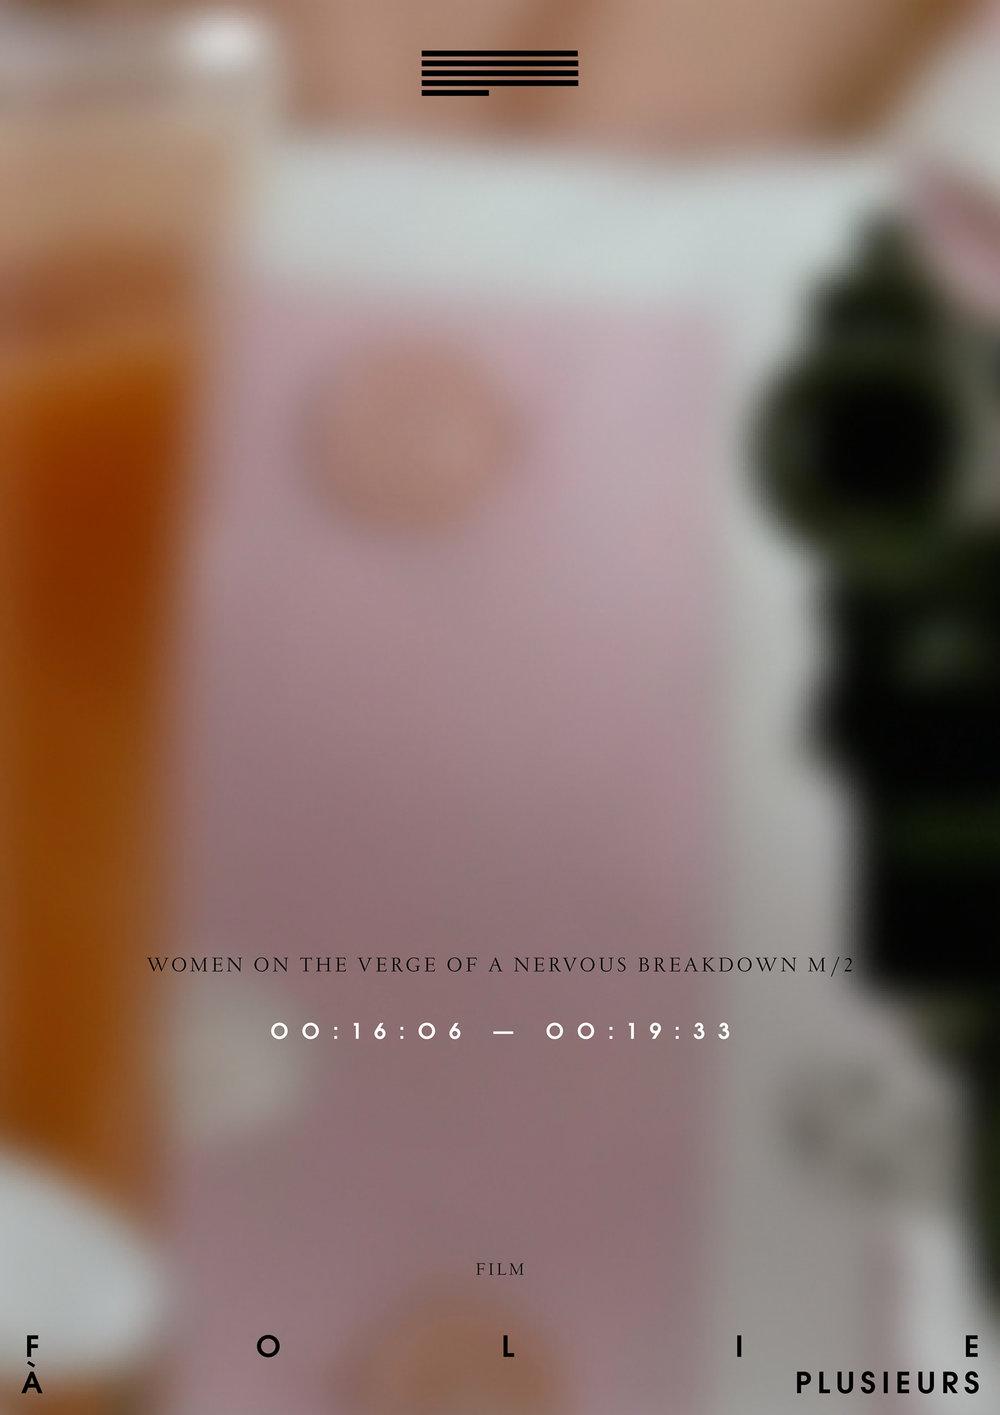 Folie-A-Plusieurs-Women-On-The-Verge-Of-A-Nervous-Breakdown-1-Perfume.jpg